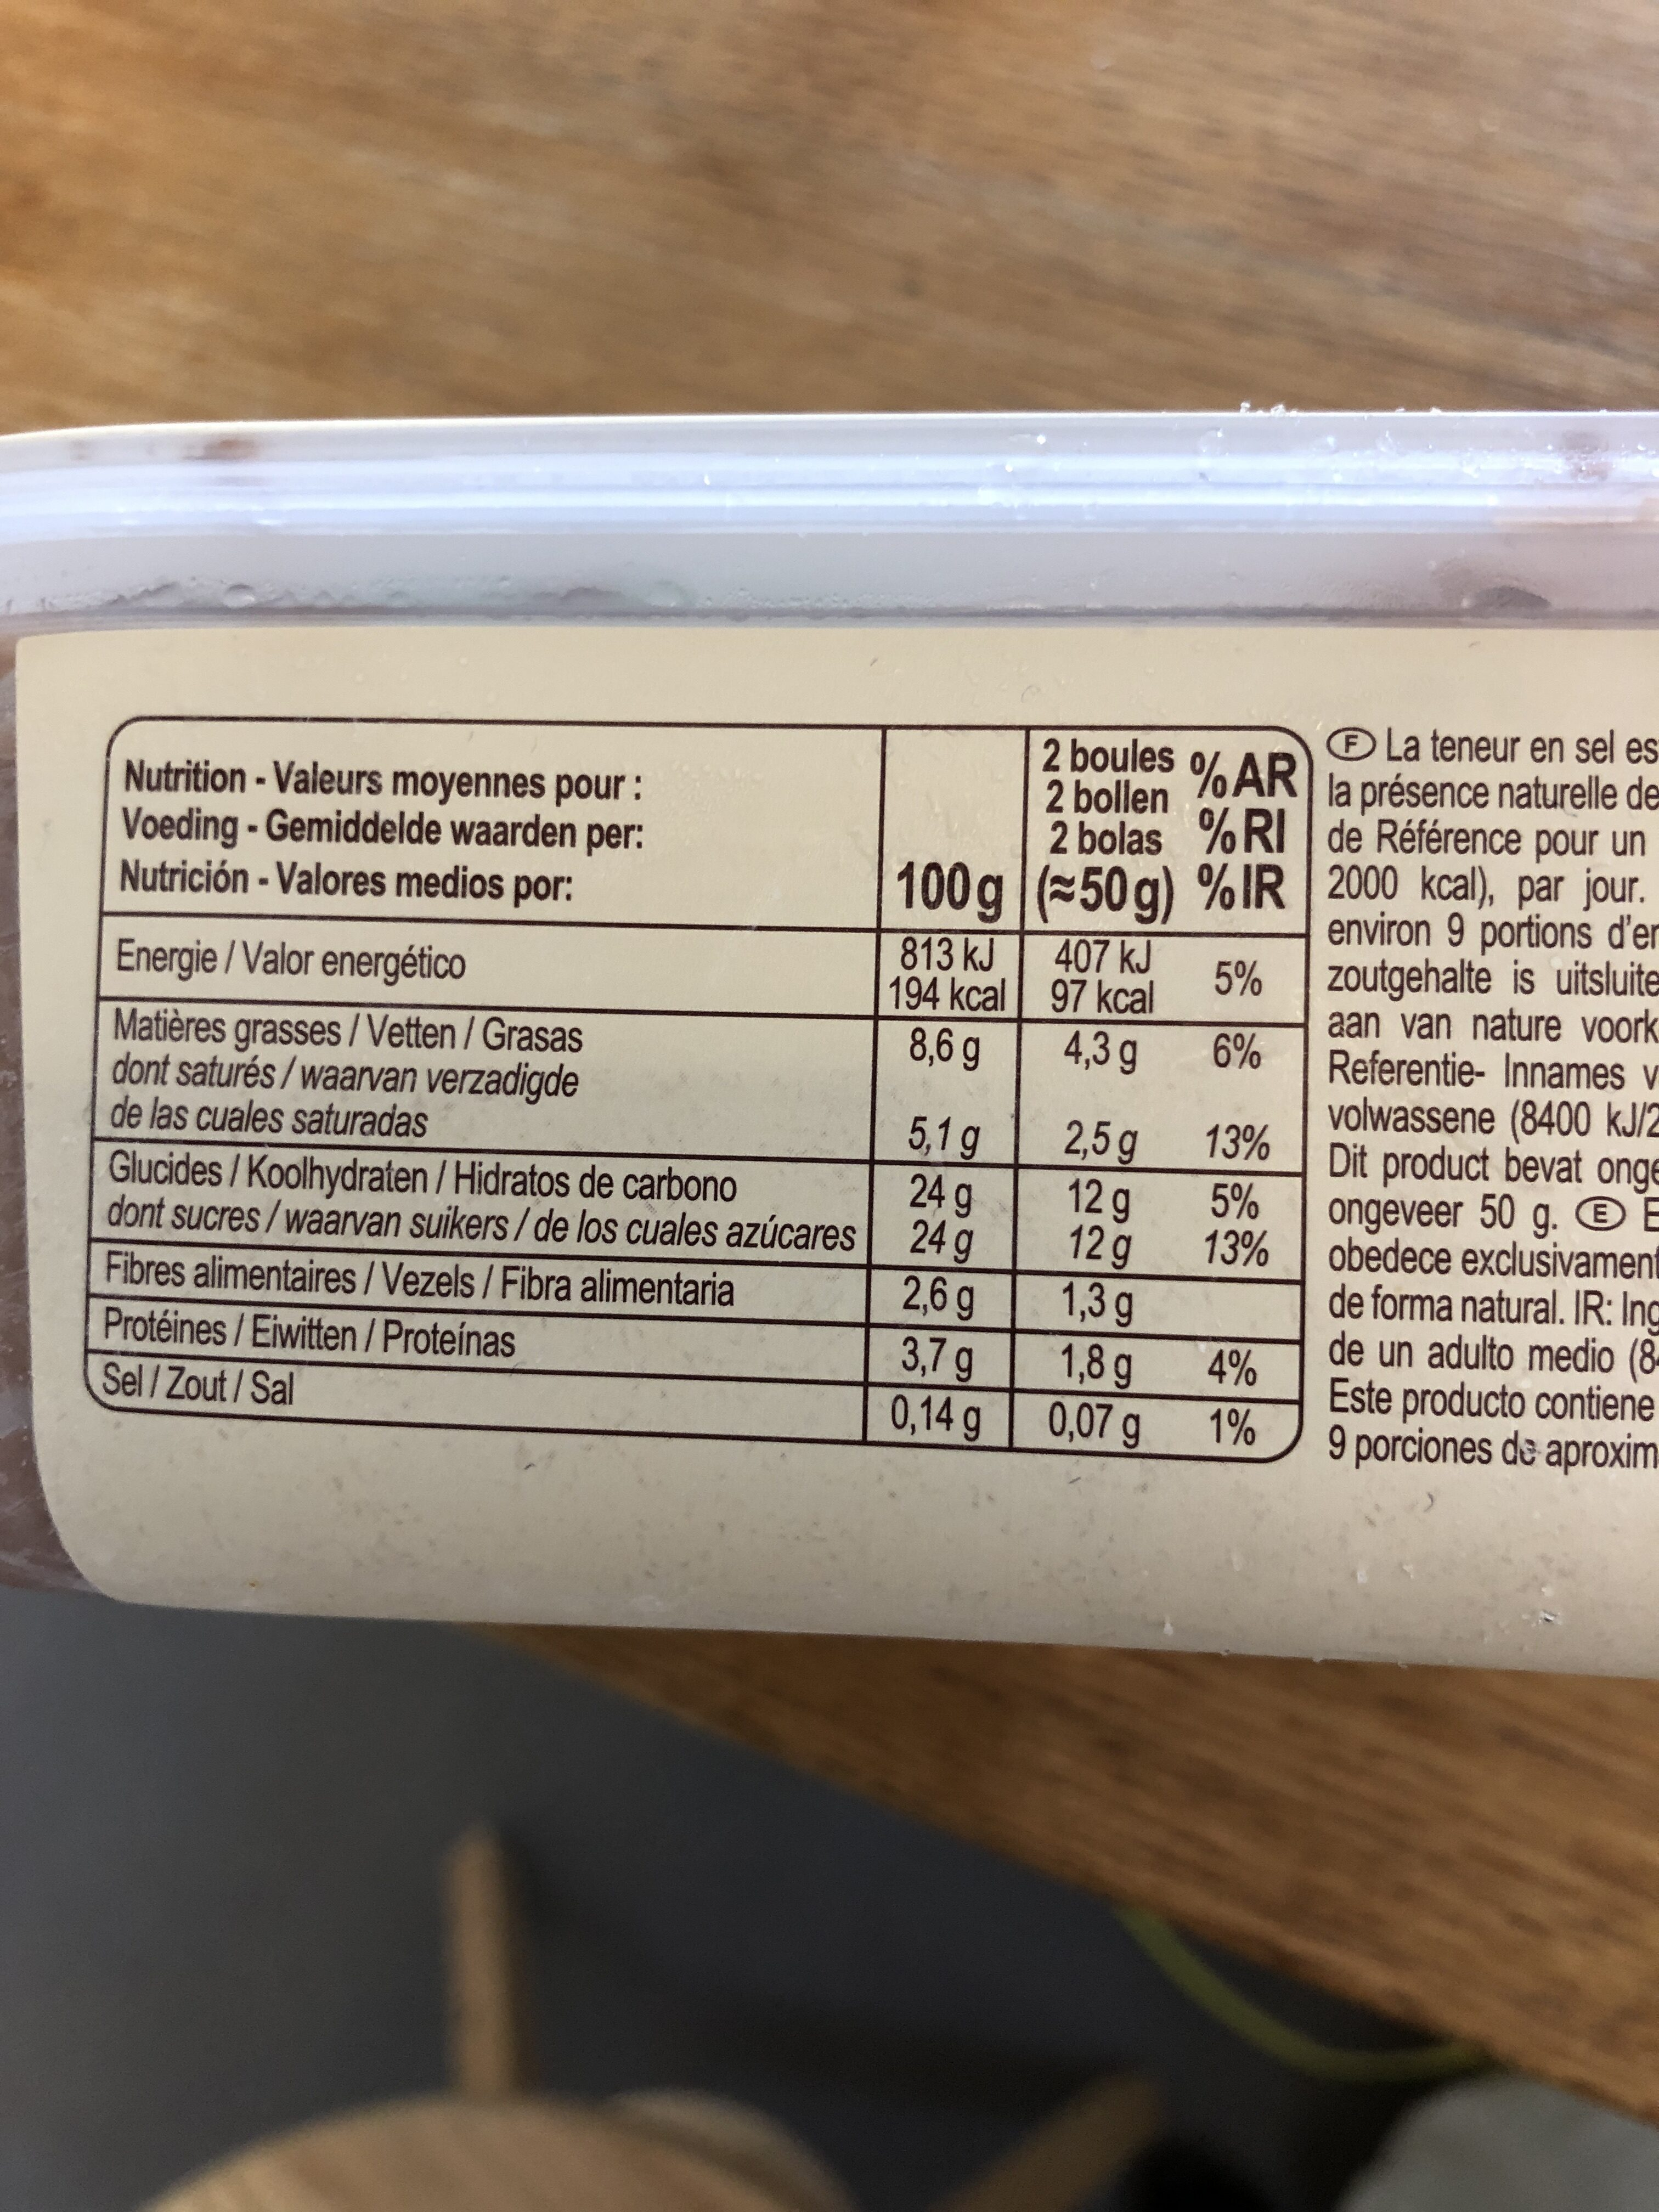 Crème glacée au chocolat - Informació nutricional - fr